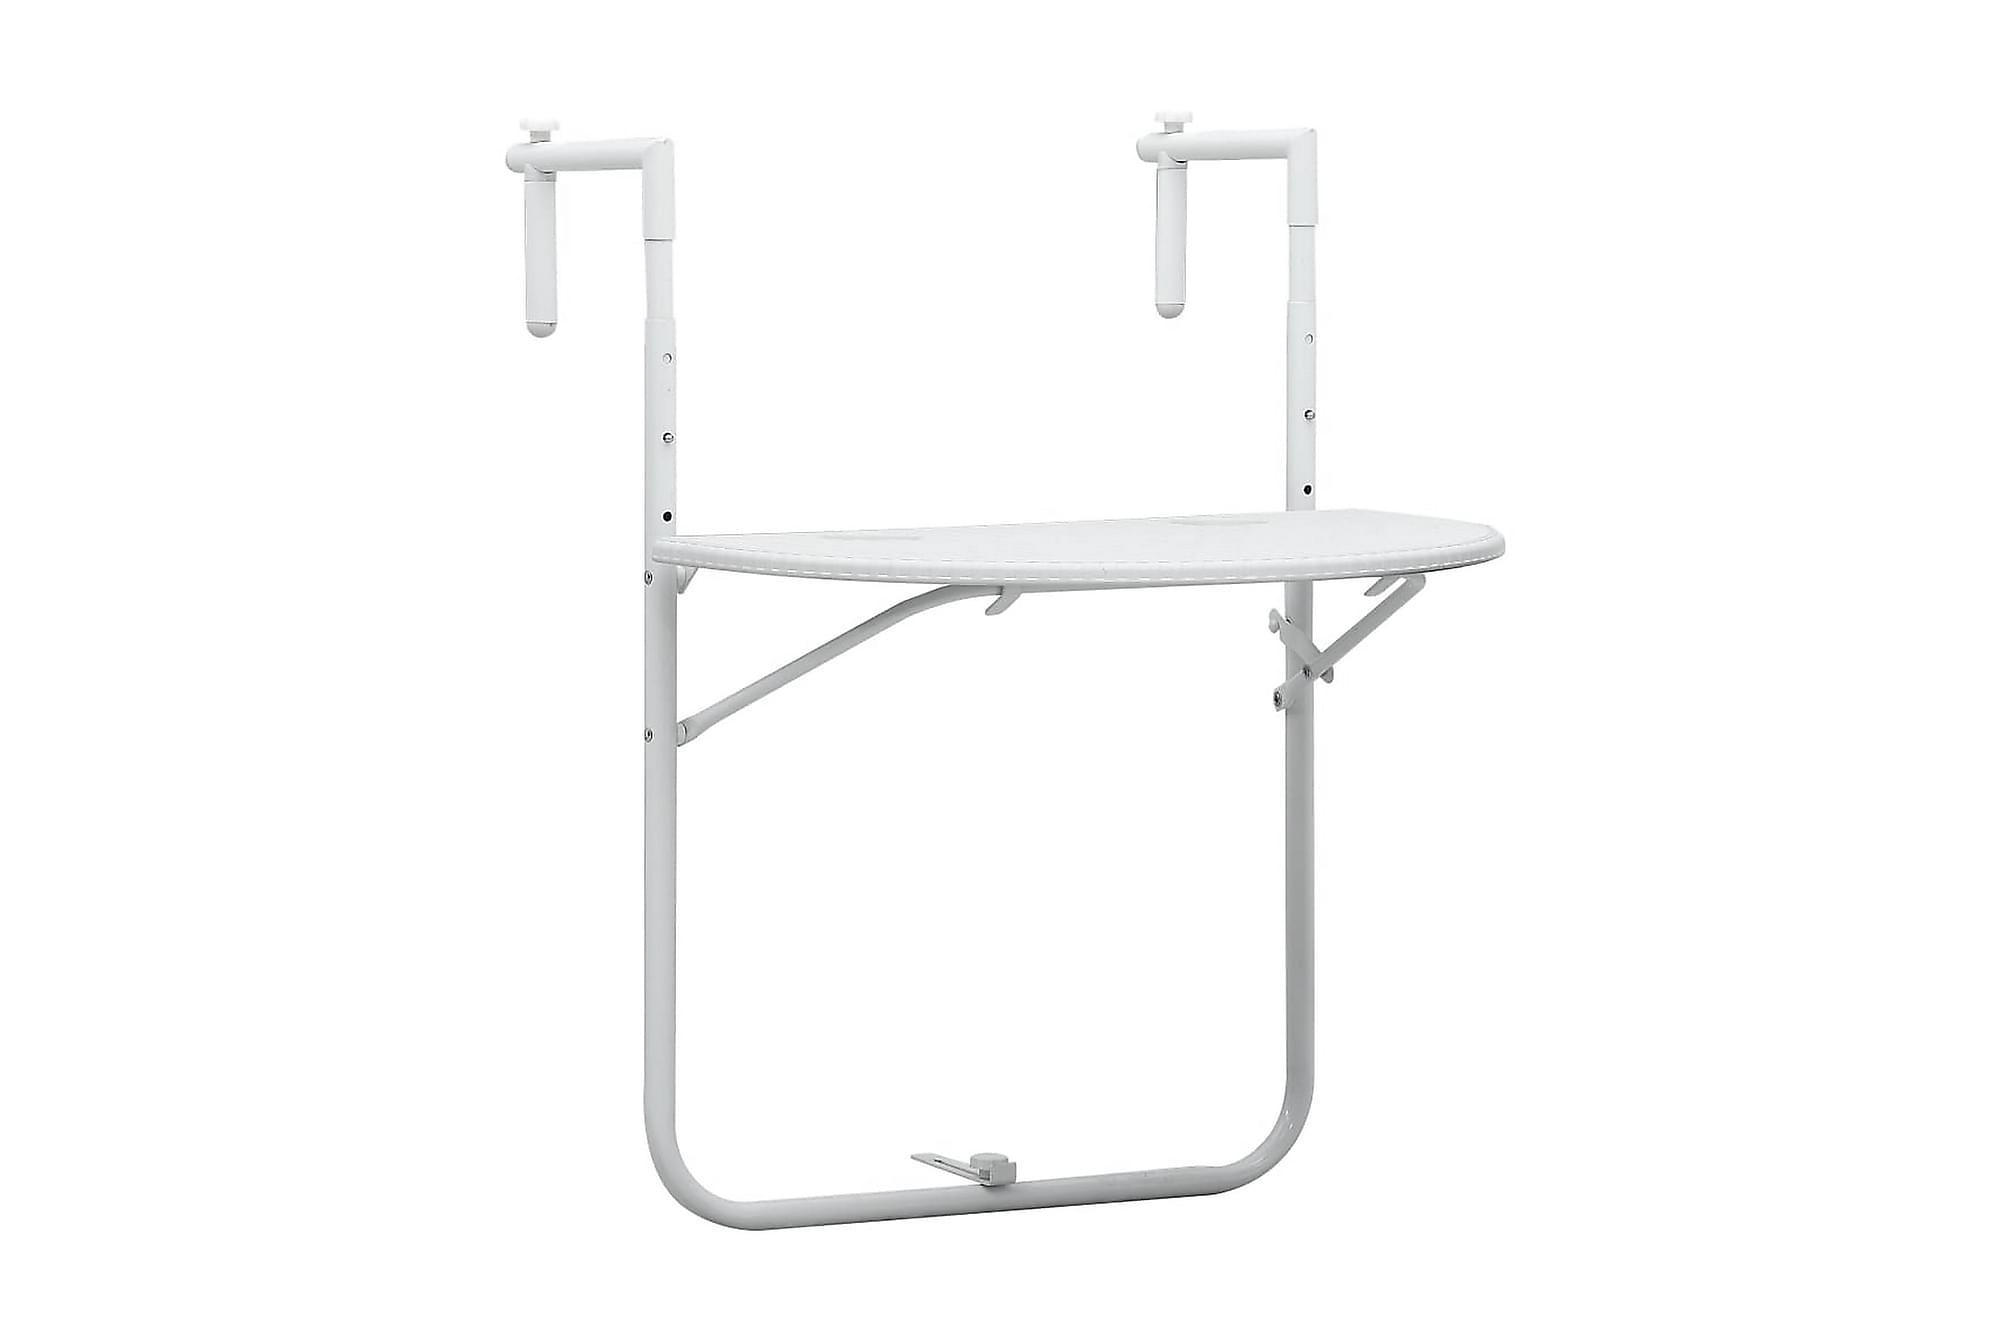 Balkongbord vit 60x64x83,5 cm plast konstrotting, Balkongbord